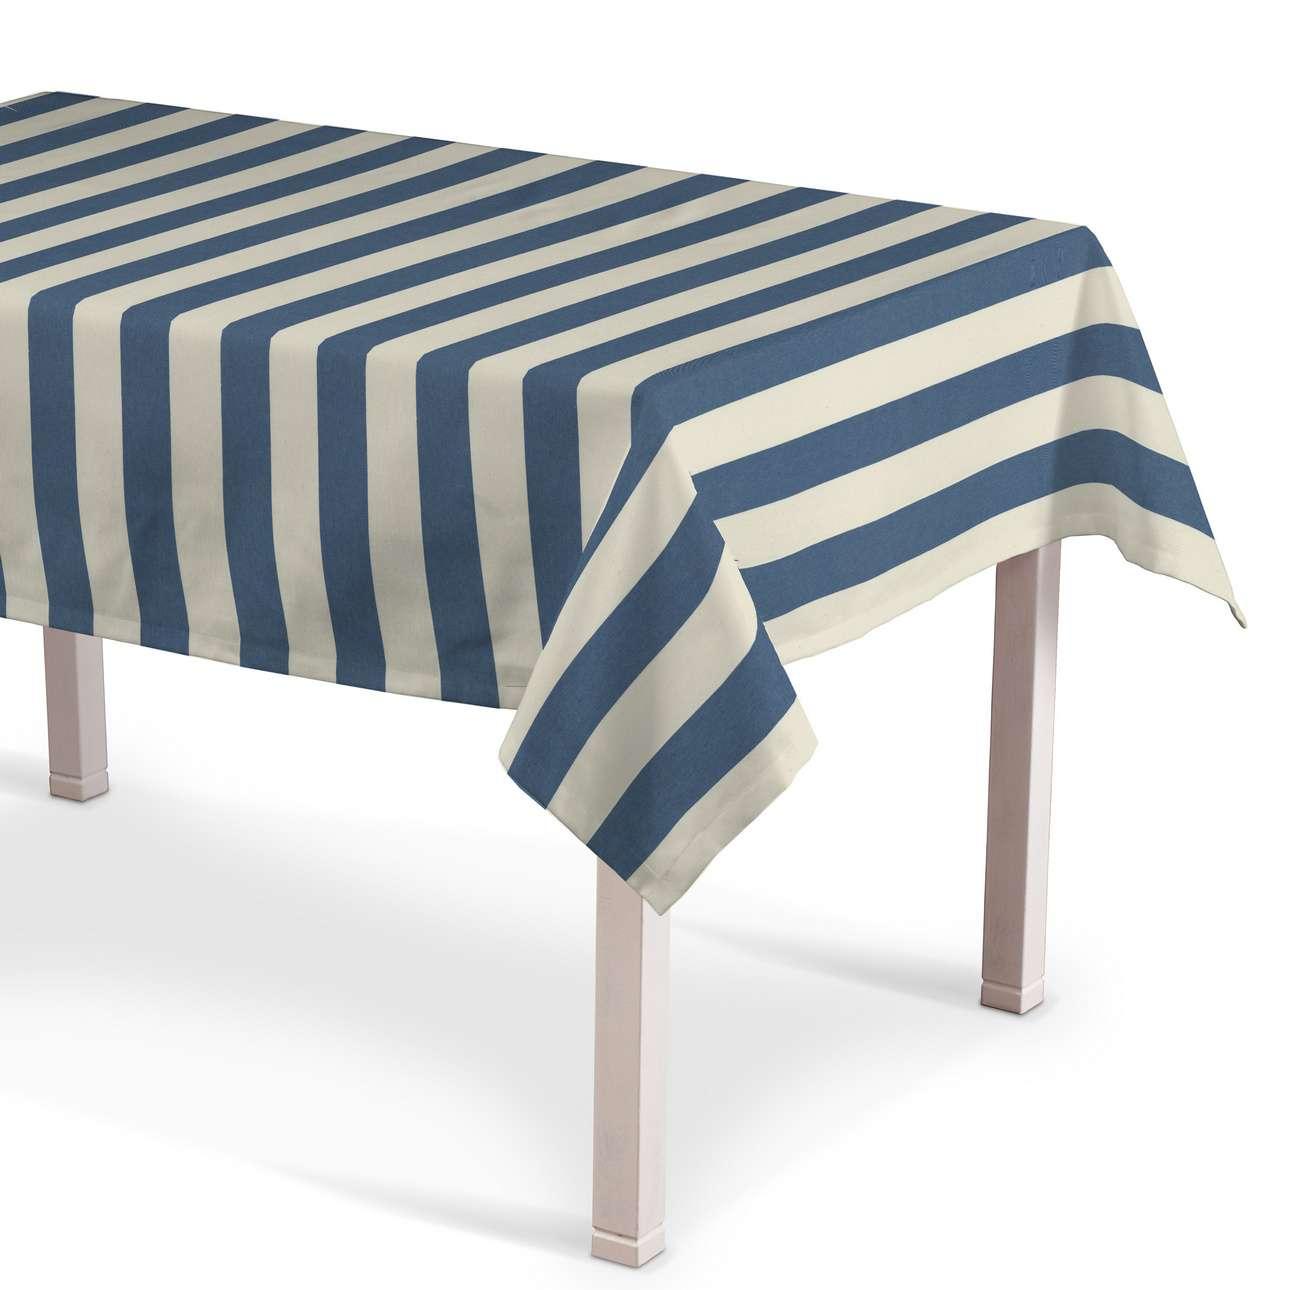 Rektangulære borddug fra kollektionen Quadro II, Stof: 142-70